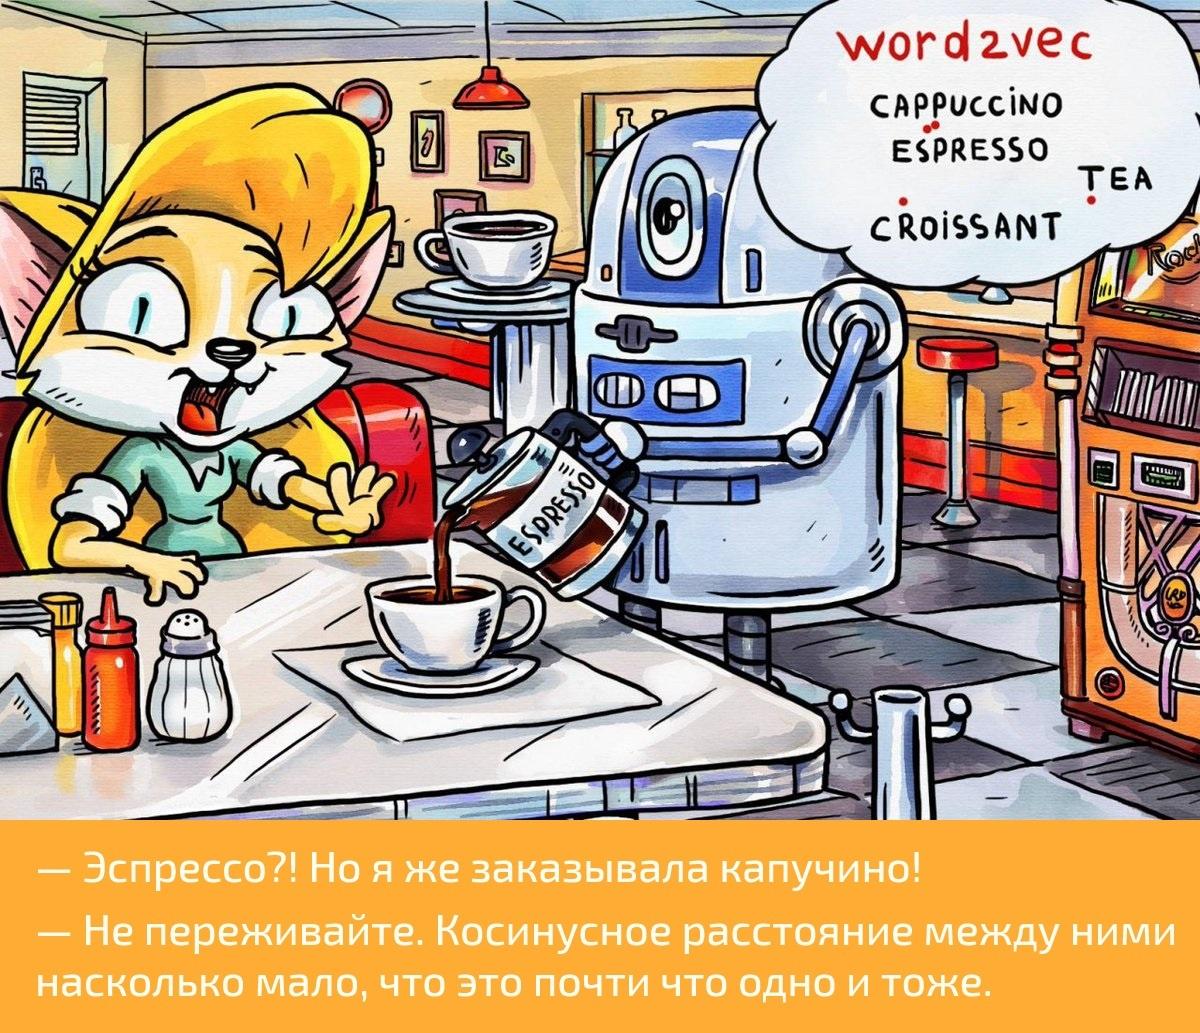 мем про дистрибутивную семантику, word2vec, робот, кофе